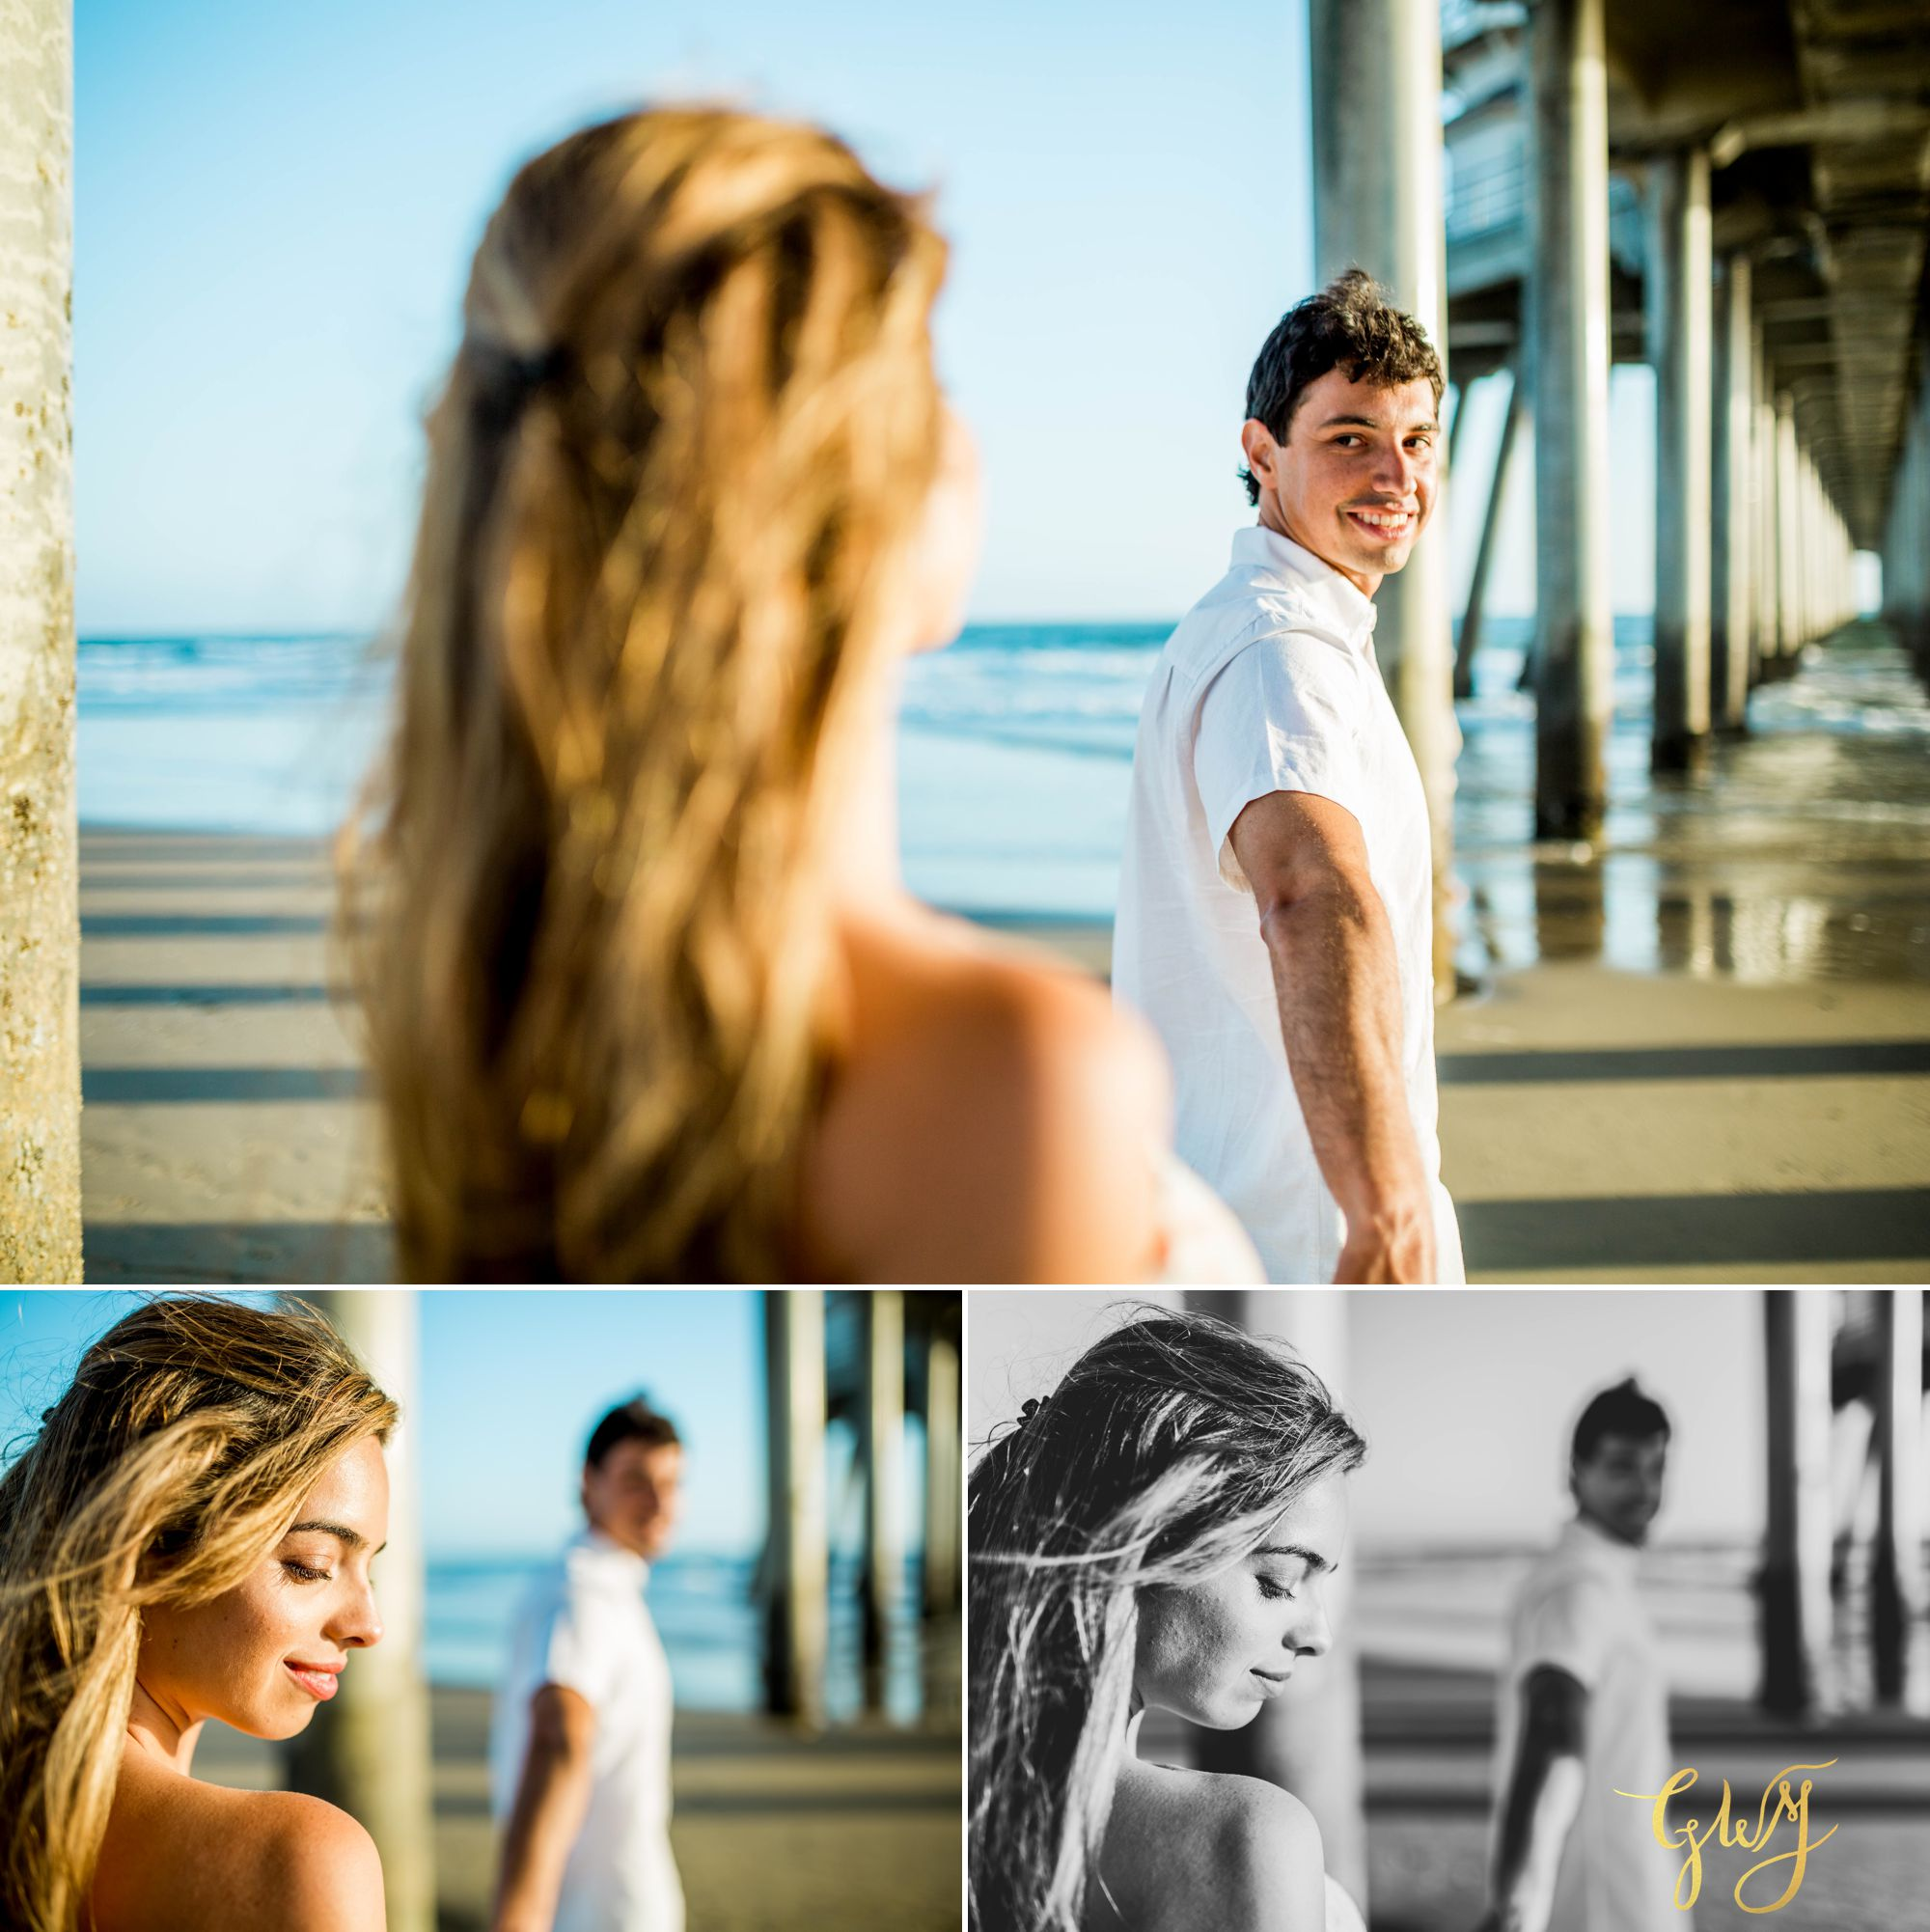 Felipe + Isabella Huntington Beach Summer Sunset Engagement Session by Glass Woods Media 14.jpg